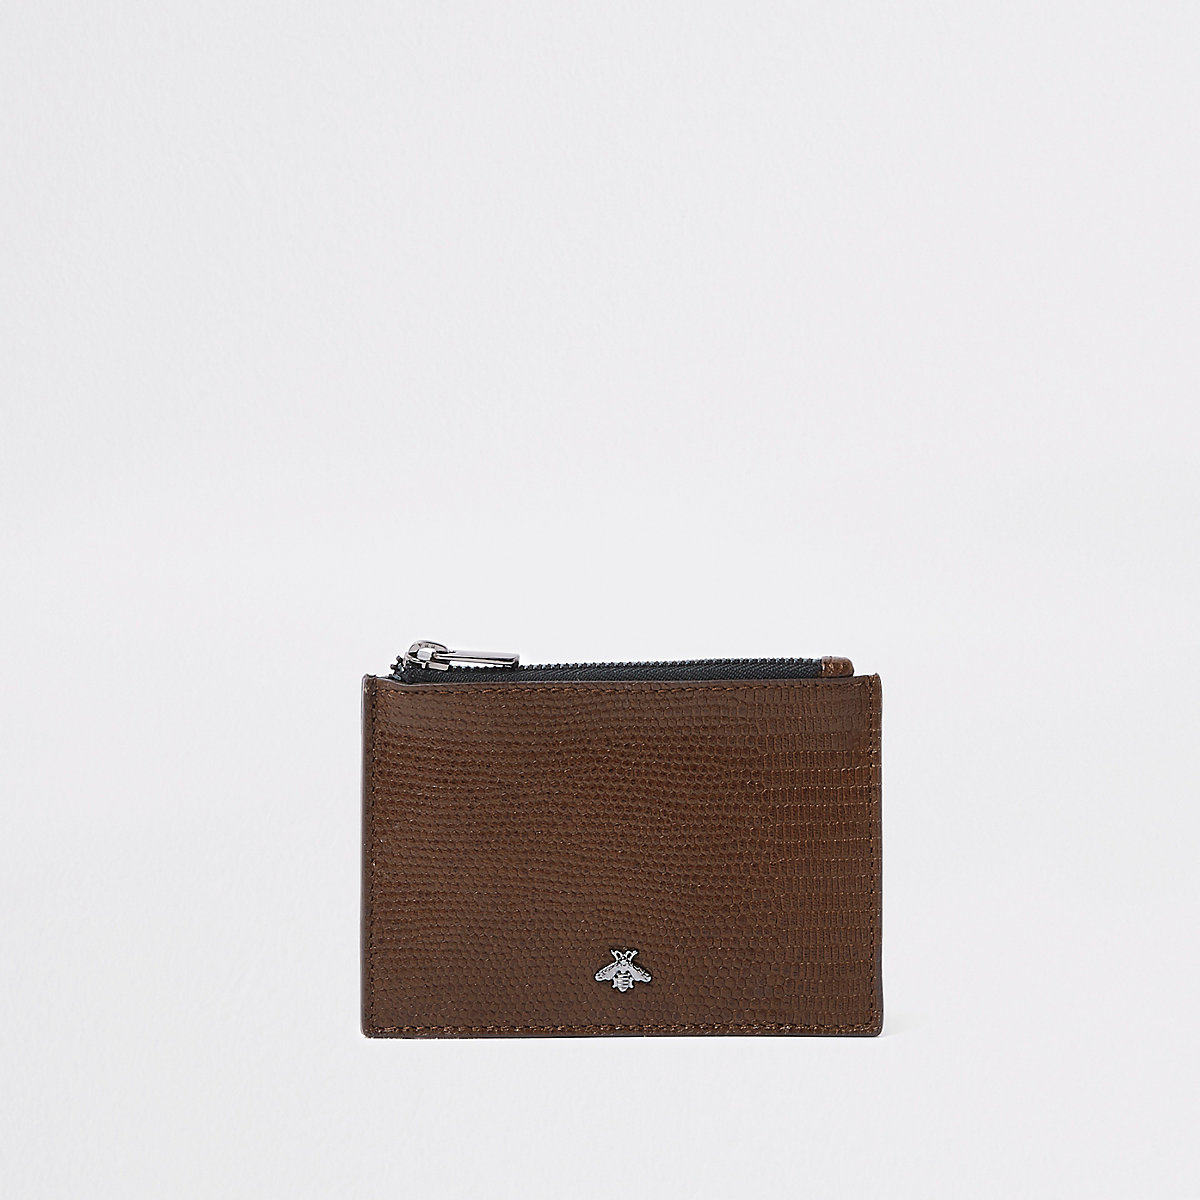 Brown snake embossed card holder